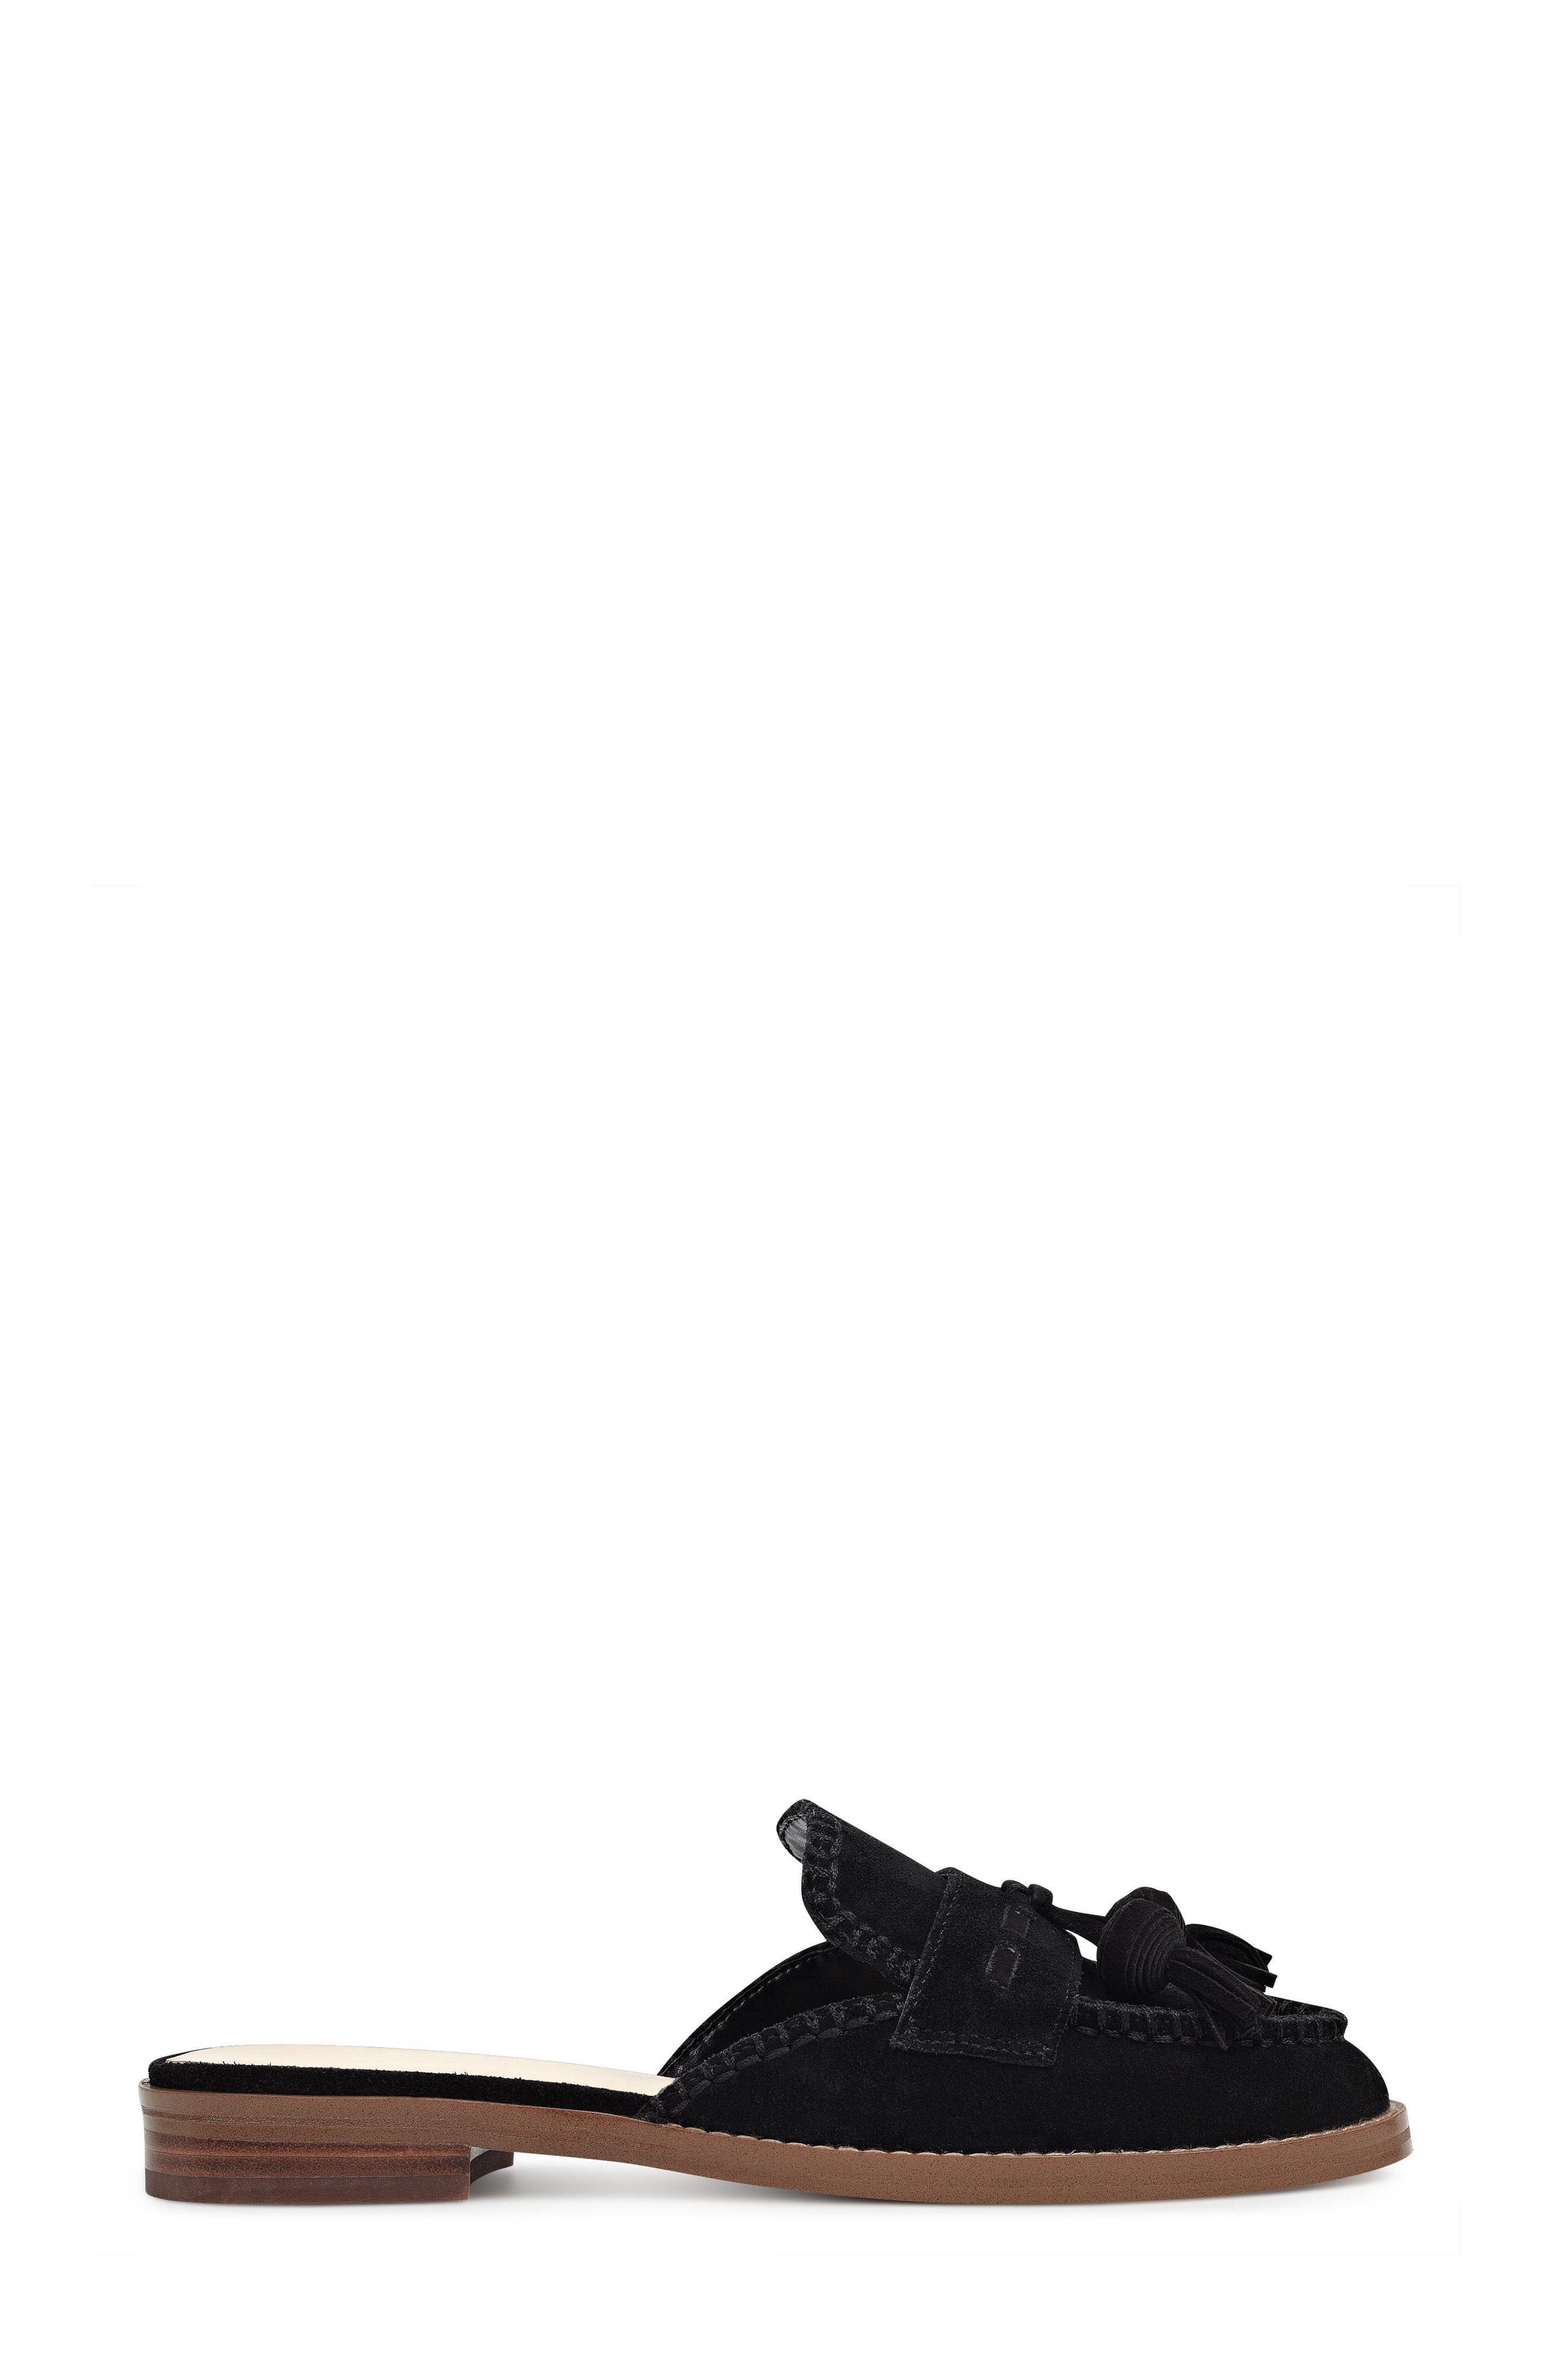 Alternate Image 3  - Nine West Vesuvio Tassel Loafer Mule (Women)